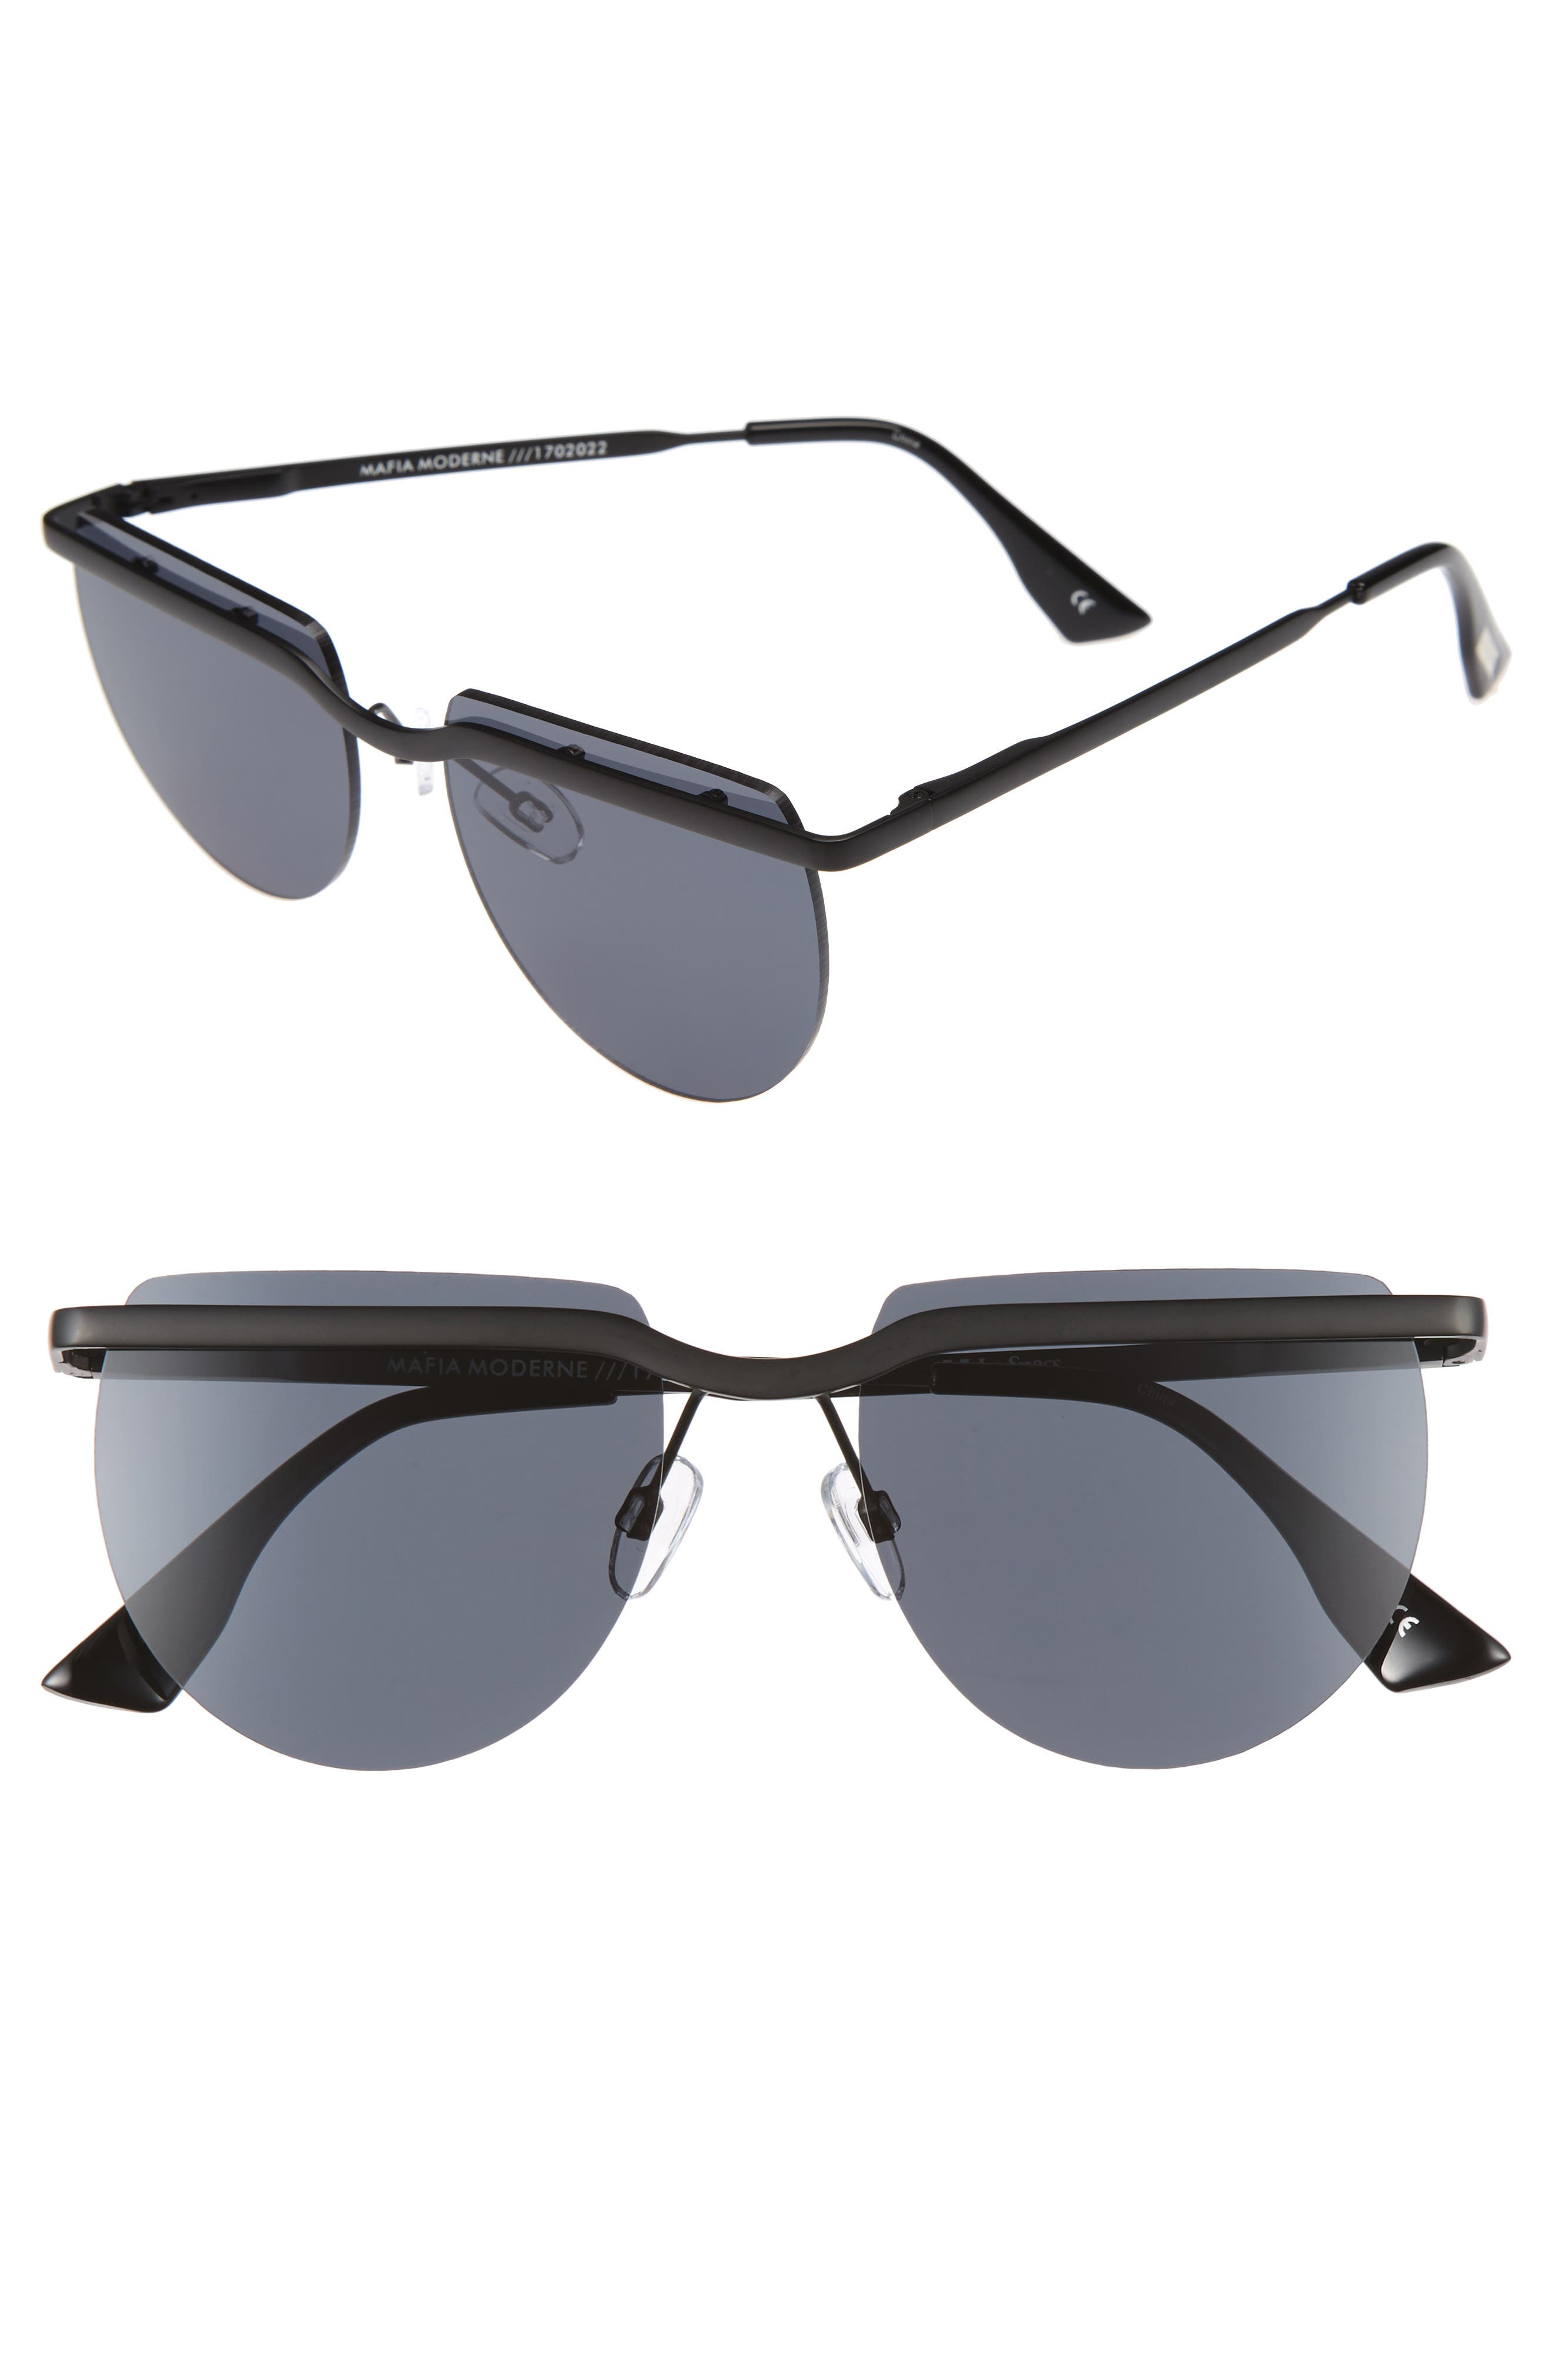 Mafia Moderne 52mm Rimless Sunglasses,                             Main thumbnail 1, color,                             Matte Black